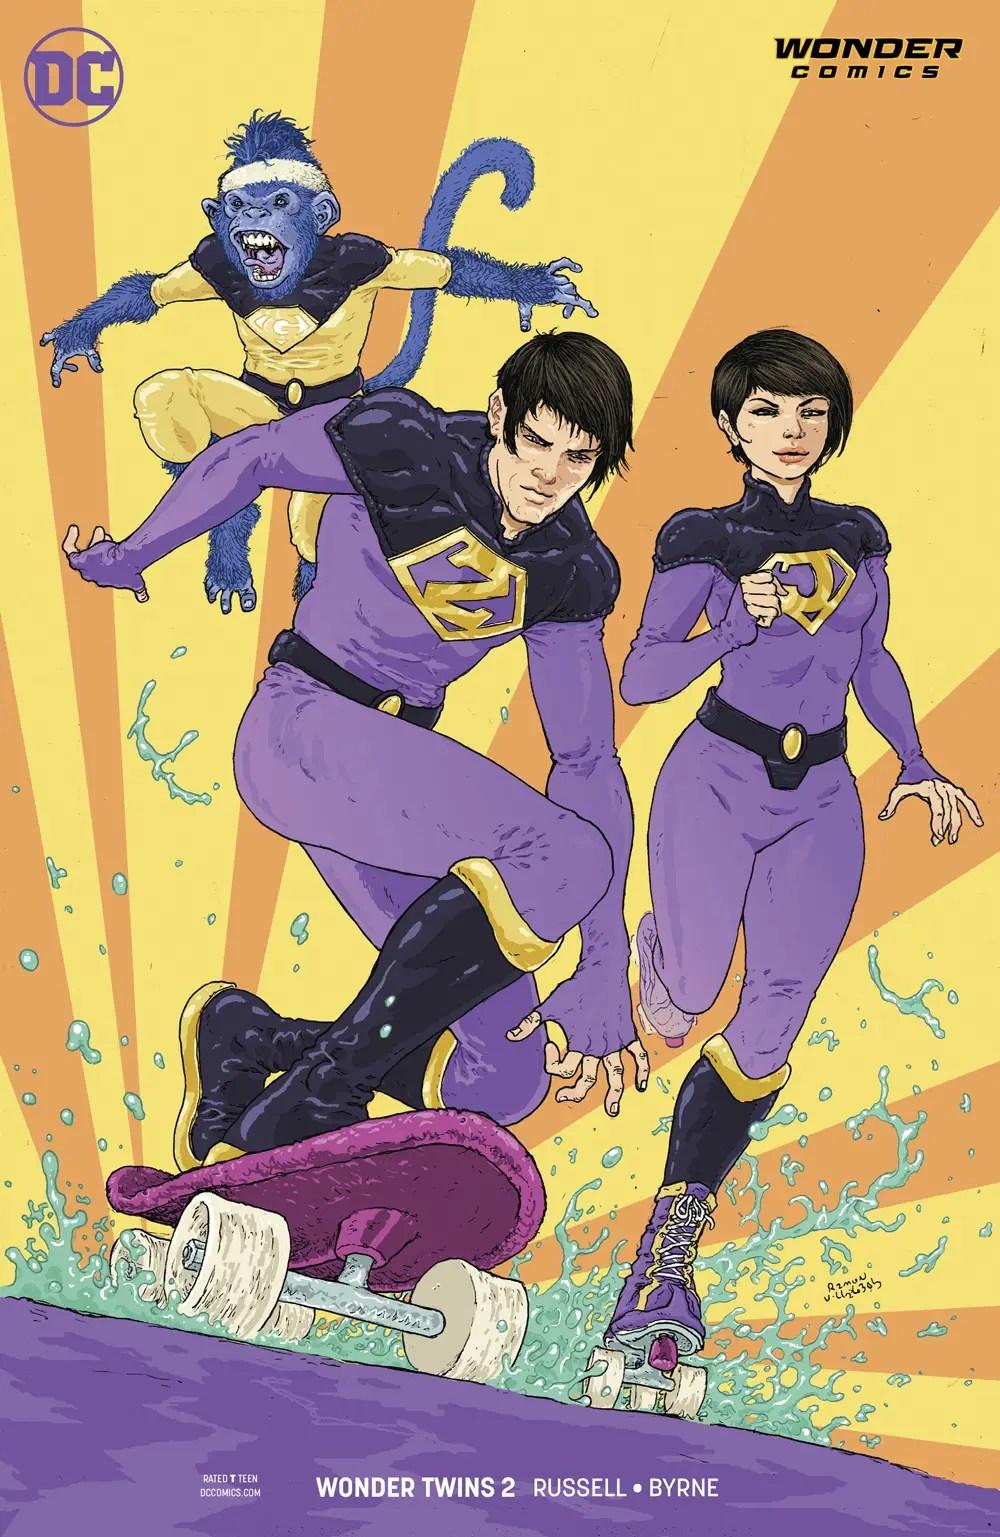 Wonder Twins #2 review: League of Annoyance!